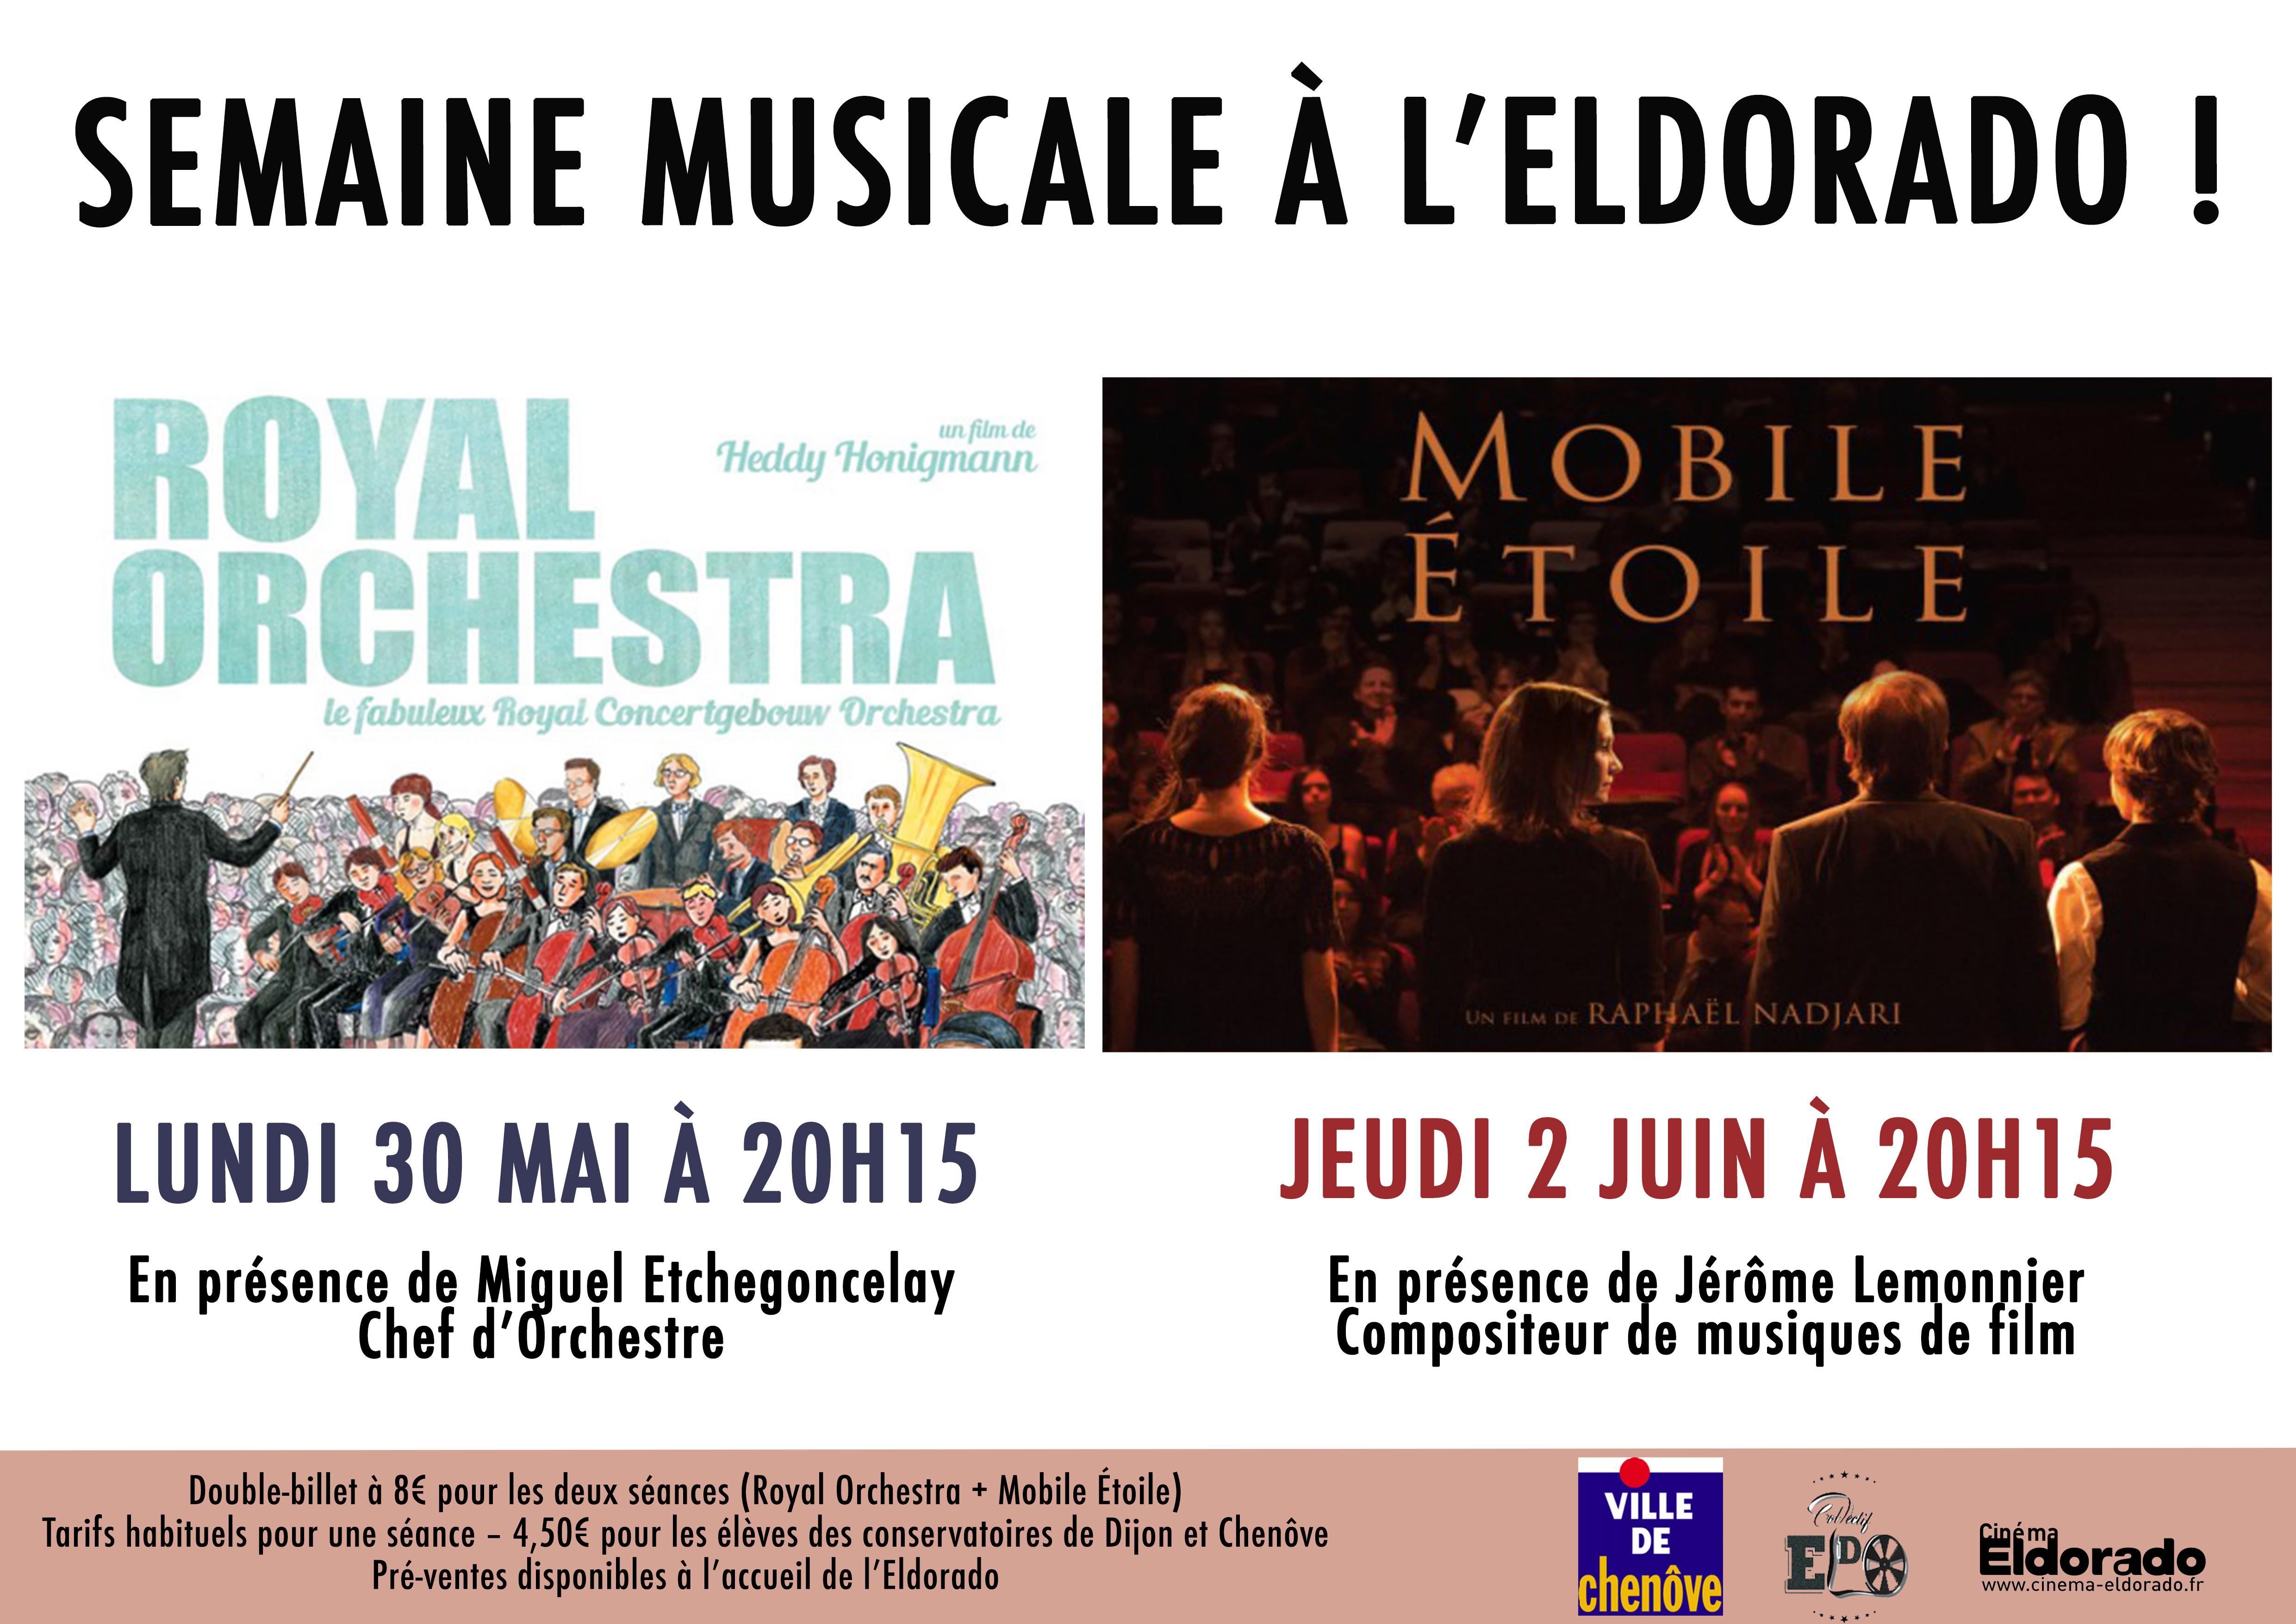 concert cinéma eldorado dijon - prévalet musique